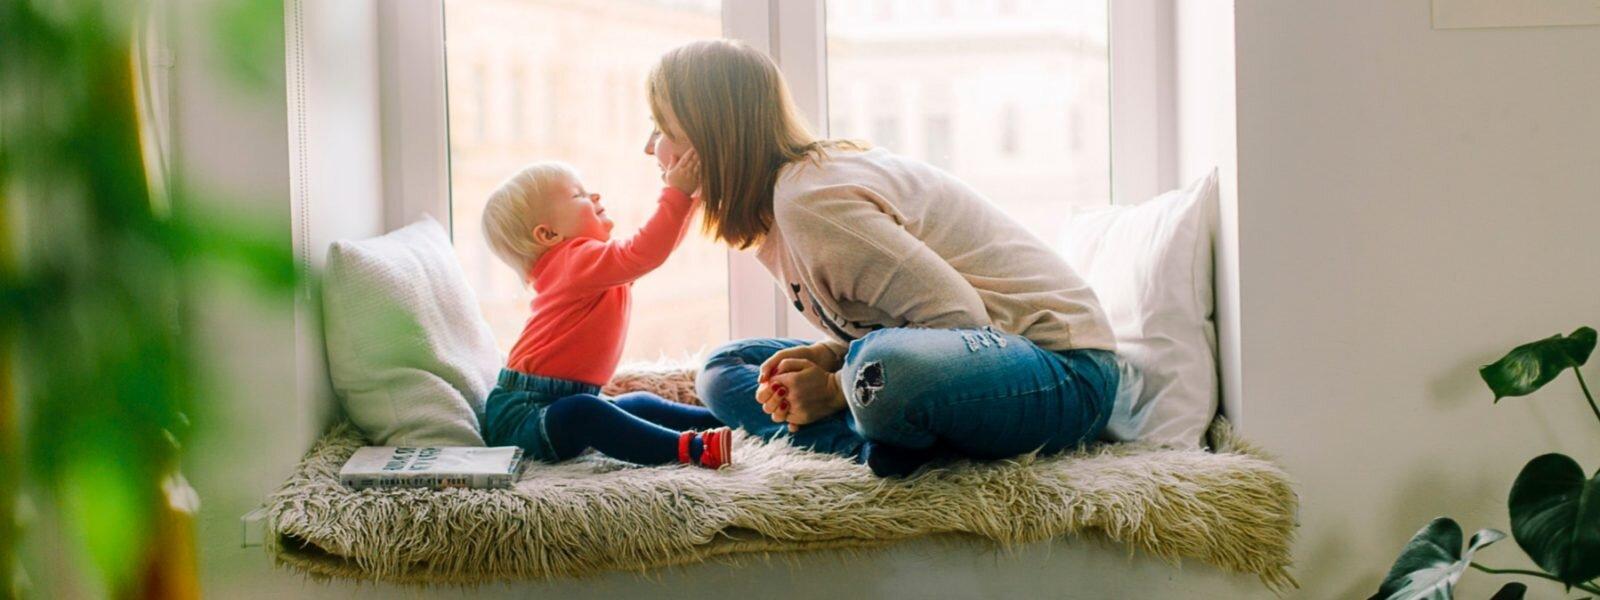 adorable-baby-babysitter-1257110-1-1600x600.jpg